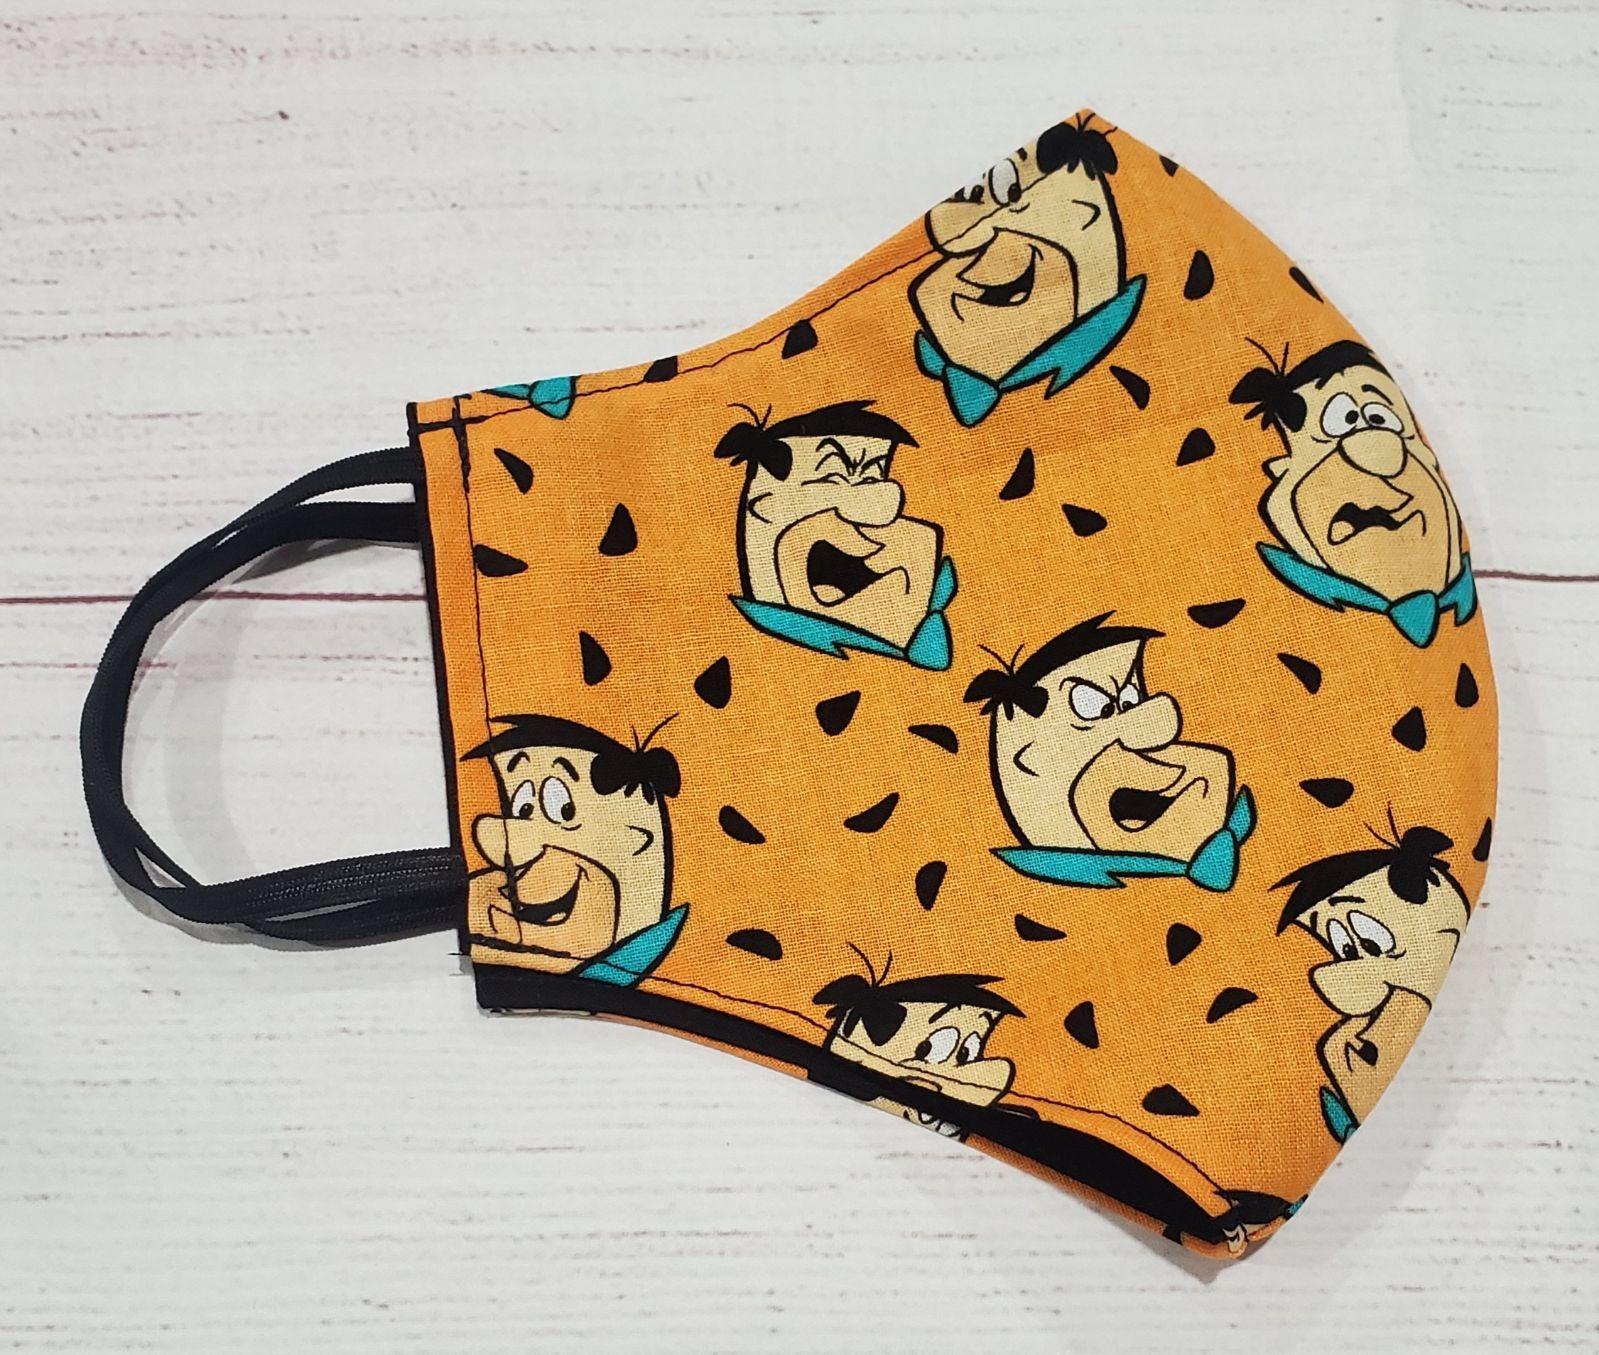 Flintstones face mask